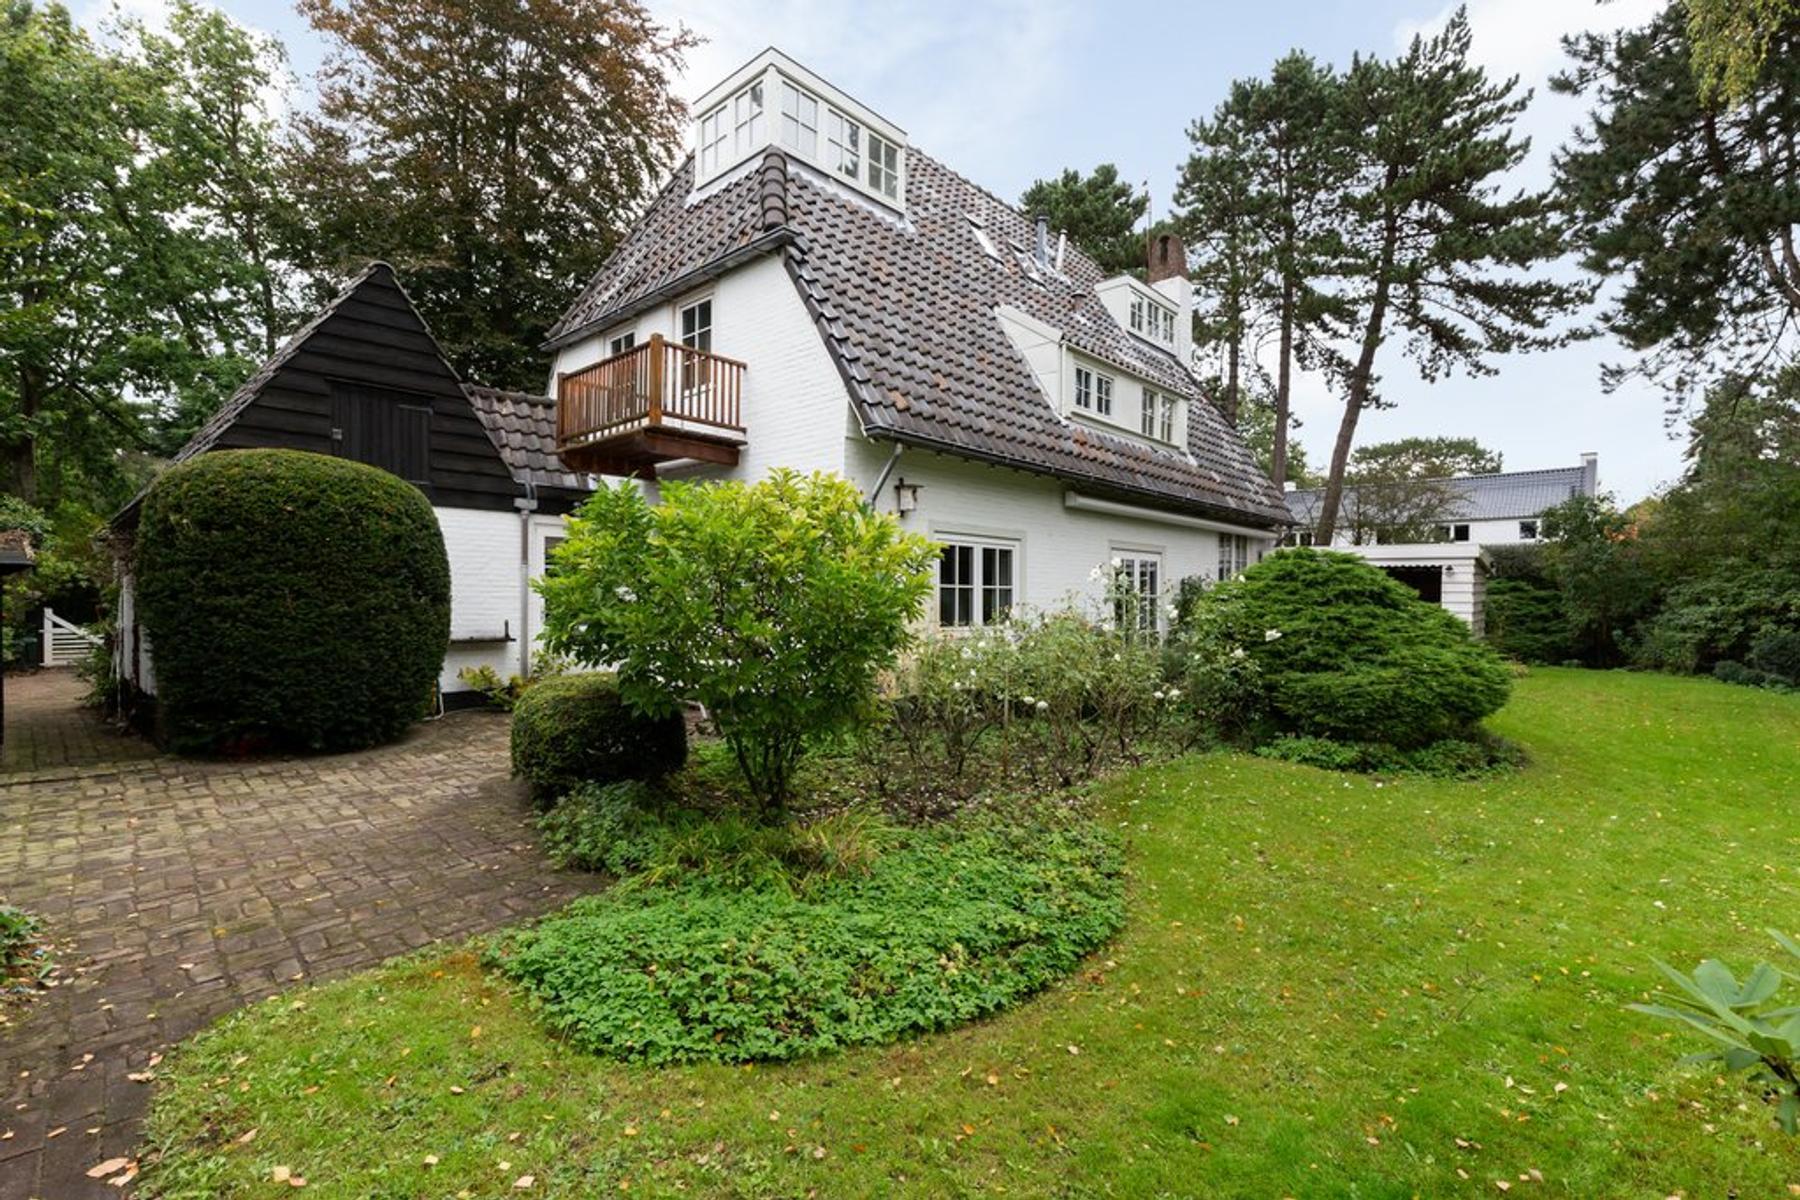 Klingelaan 24 in Wassenaar 2244 AR